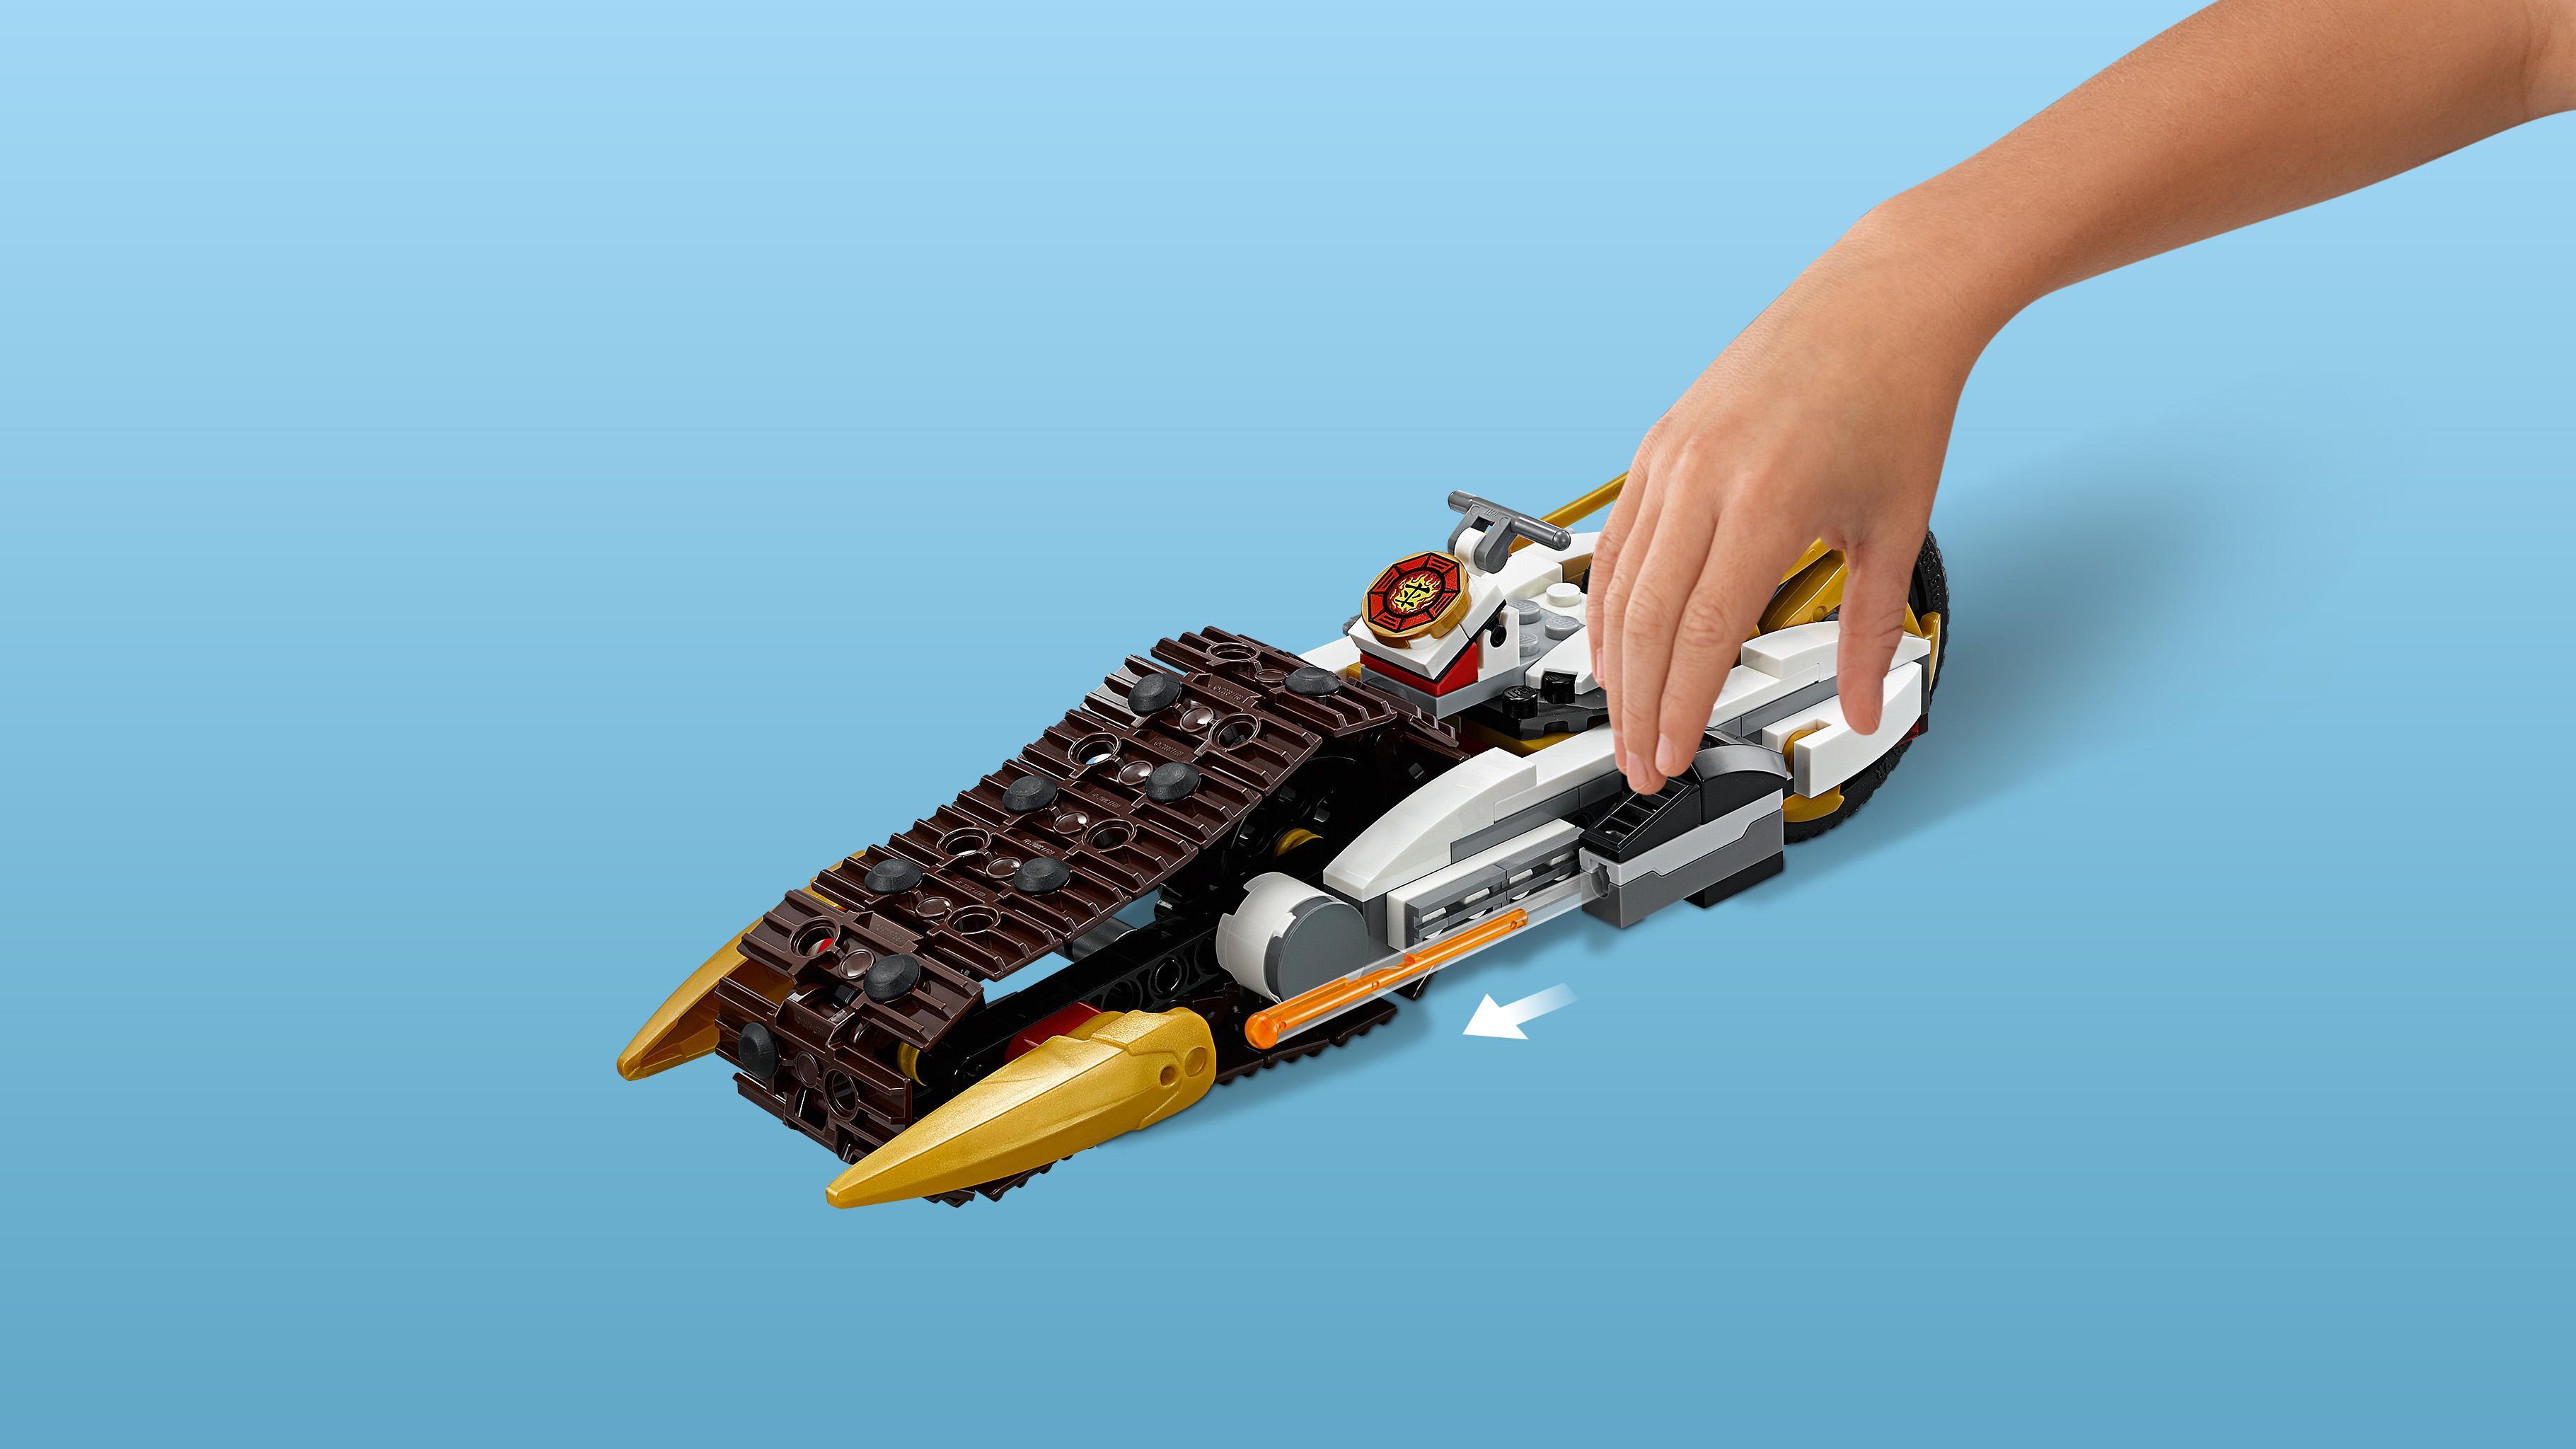 lego ninjago 70595 ultra tarnkappen fahrzeug spielzeug f r neun j hrige kinder. Black Bedroom Furniture Sets. Home Design Ideas